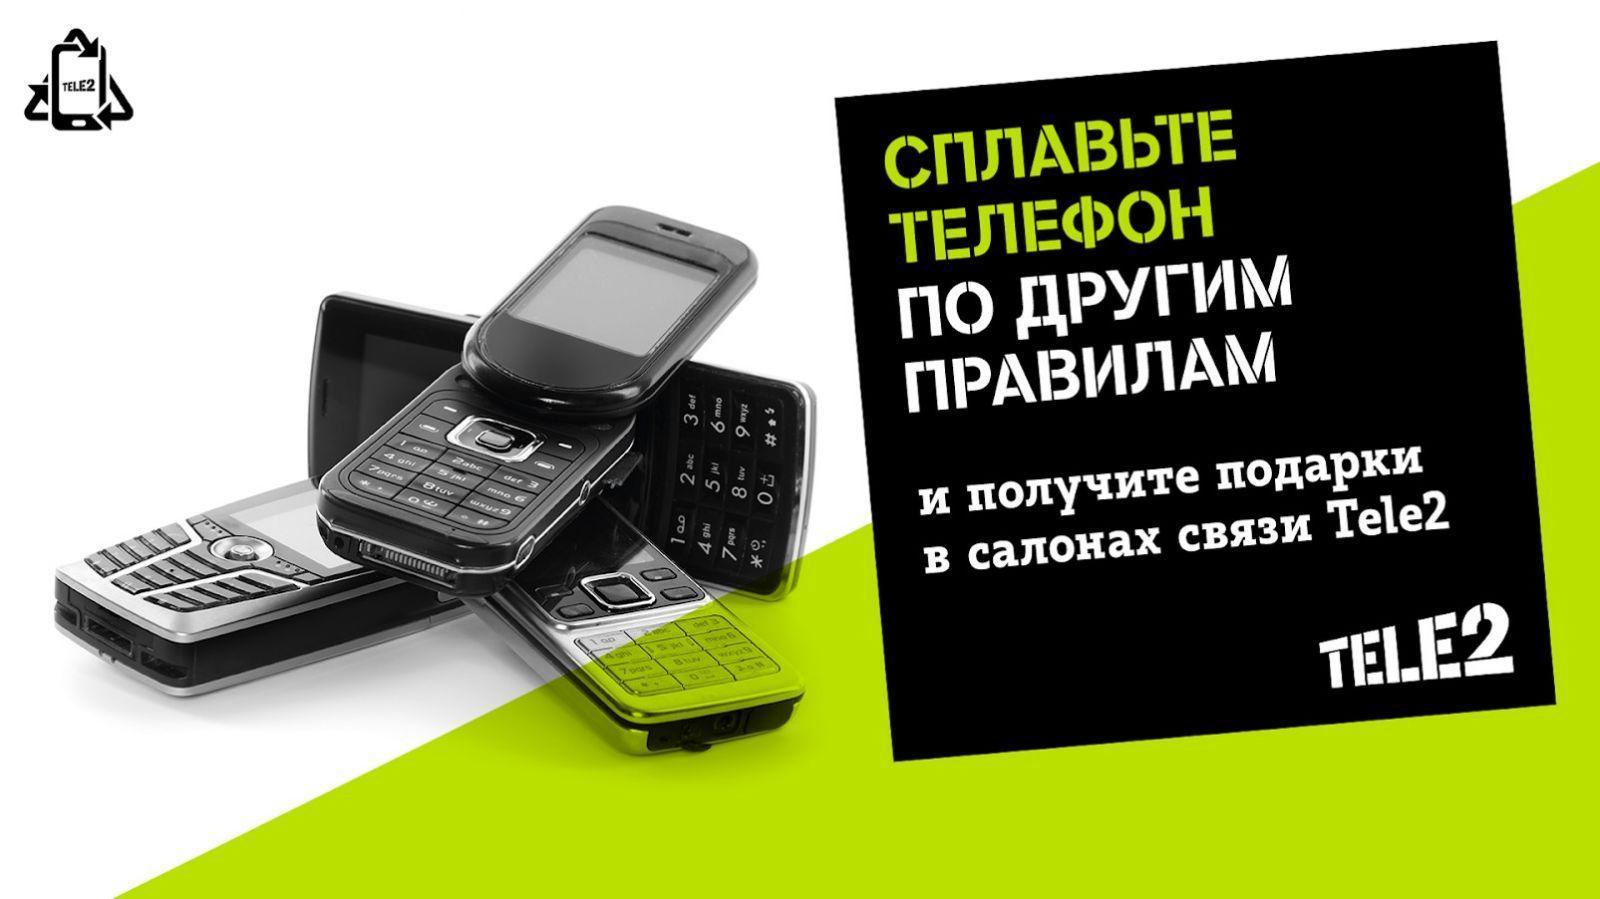 Tele2 принимает на переработку телефоны в салонах Москвы и области (Tele2 Recycle smartphone at other rules)